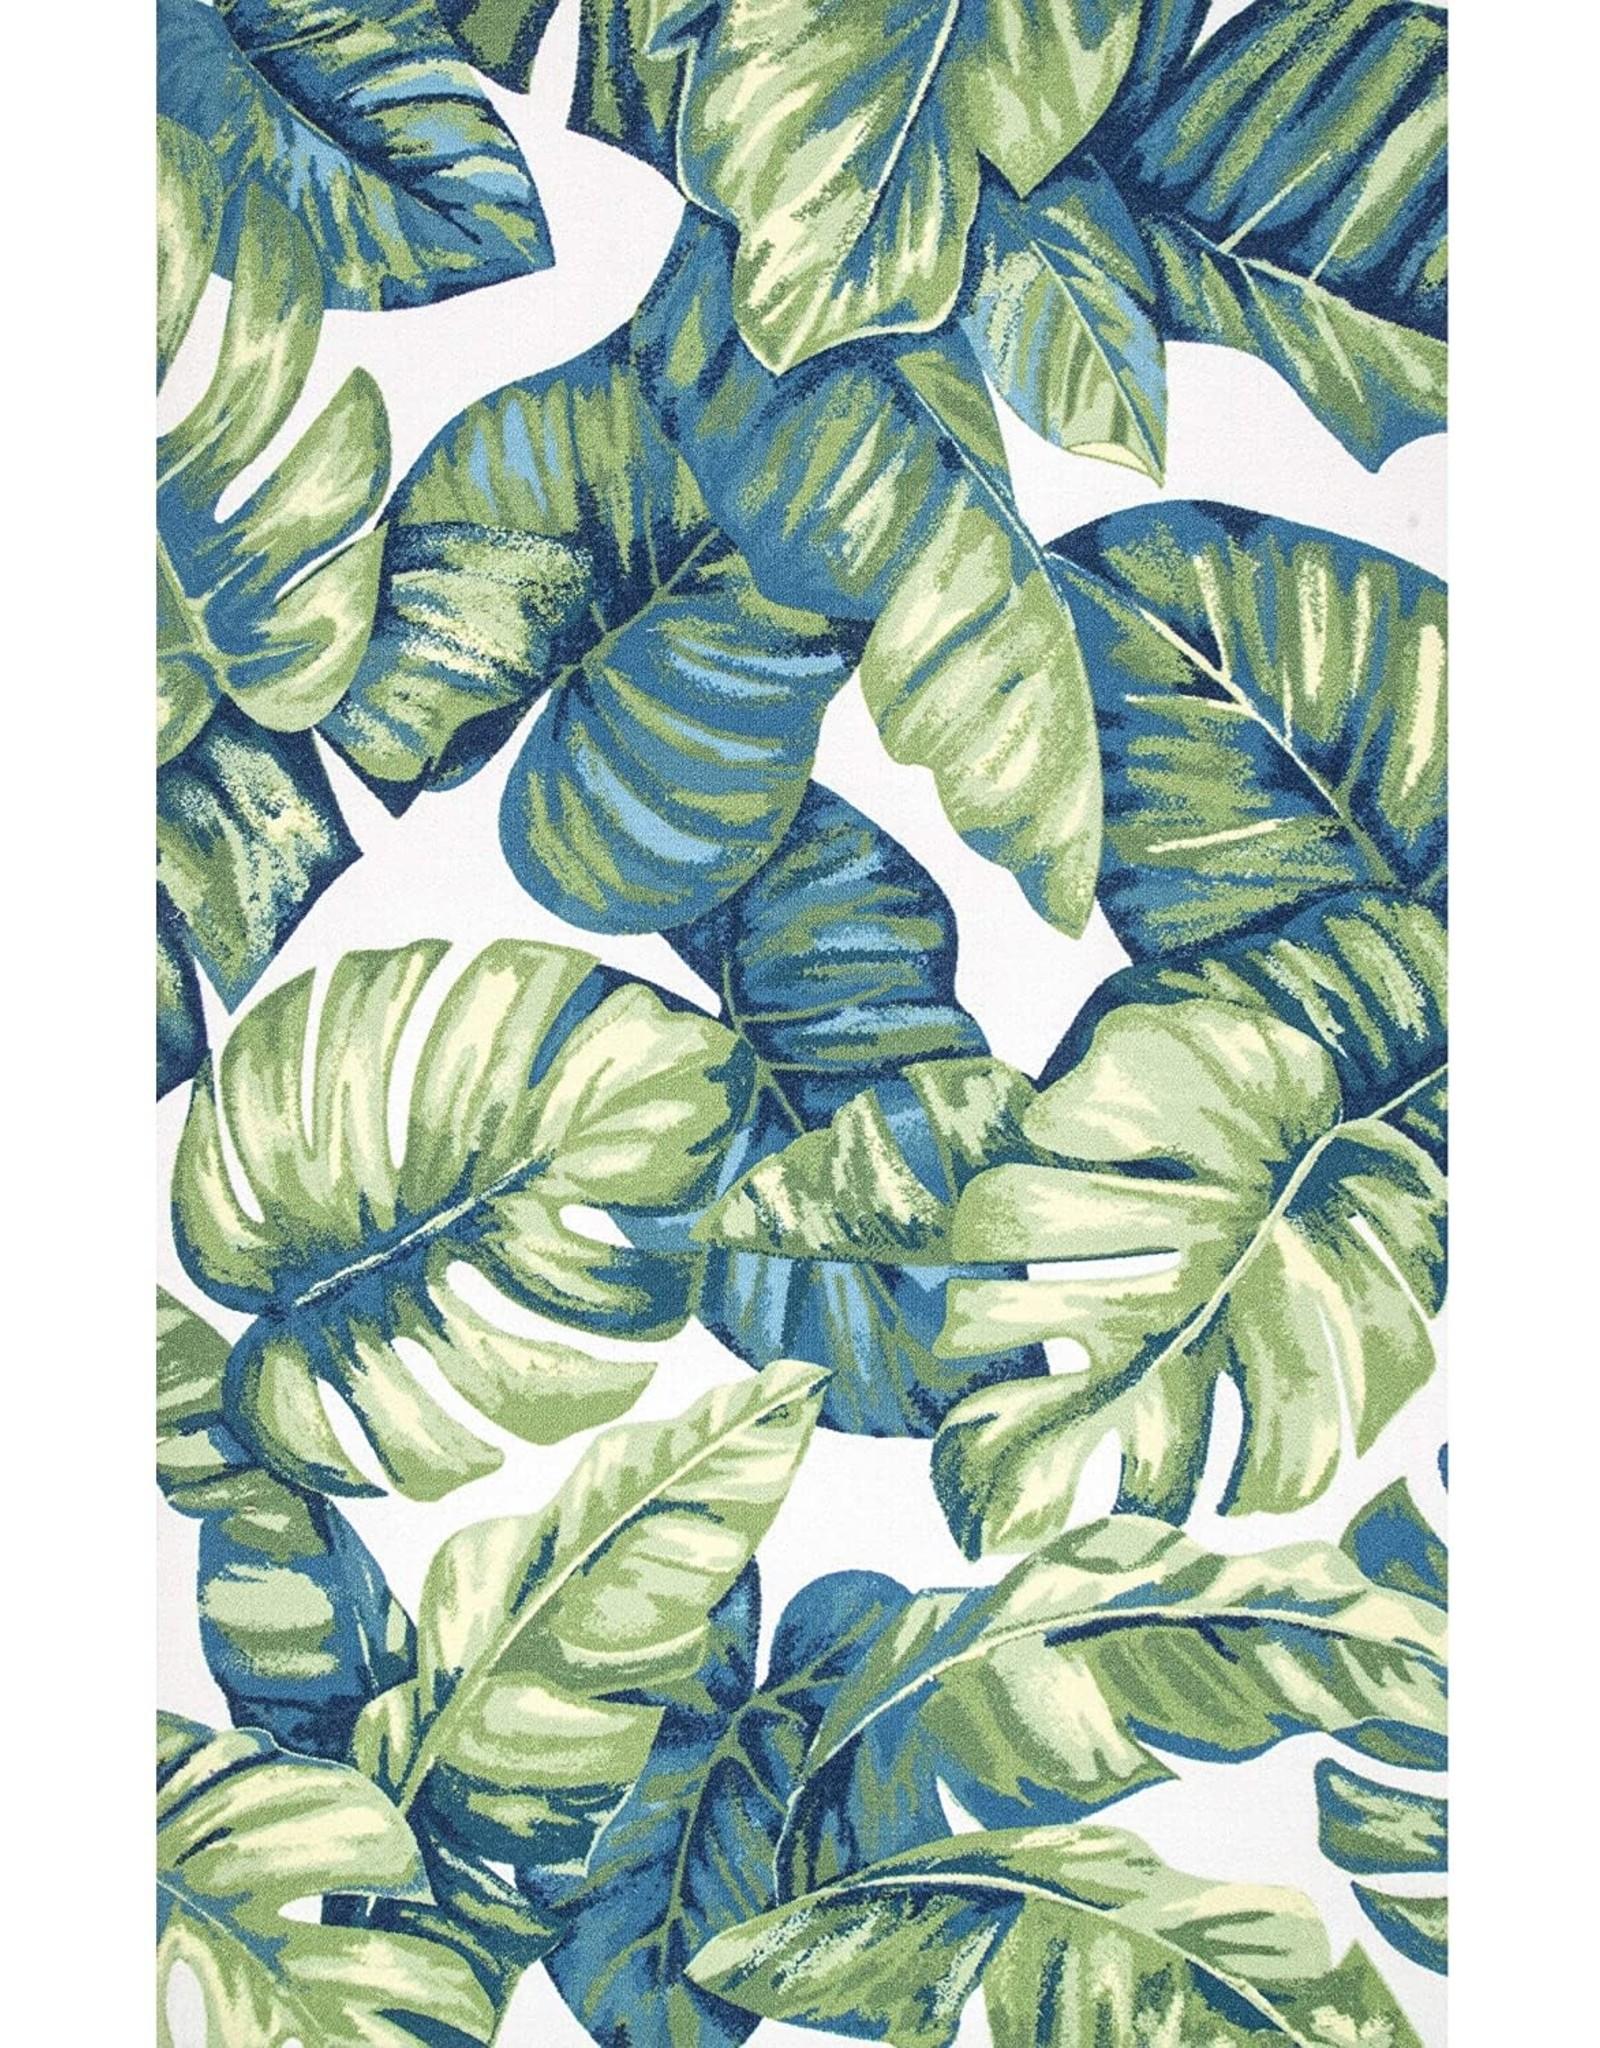 nuLOOM nuLOOM Lisa Floral Indoor/Outdoor Area Rug, 8' x 10' Oval, Multi